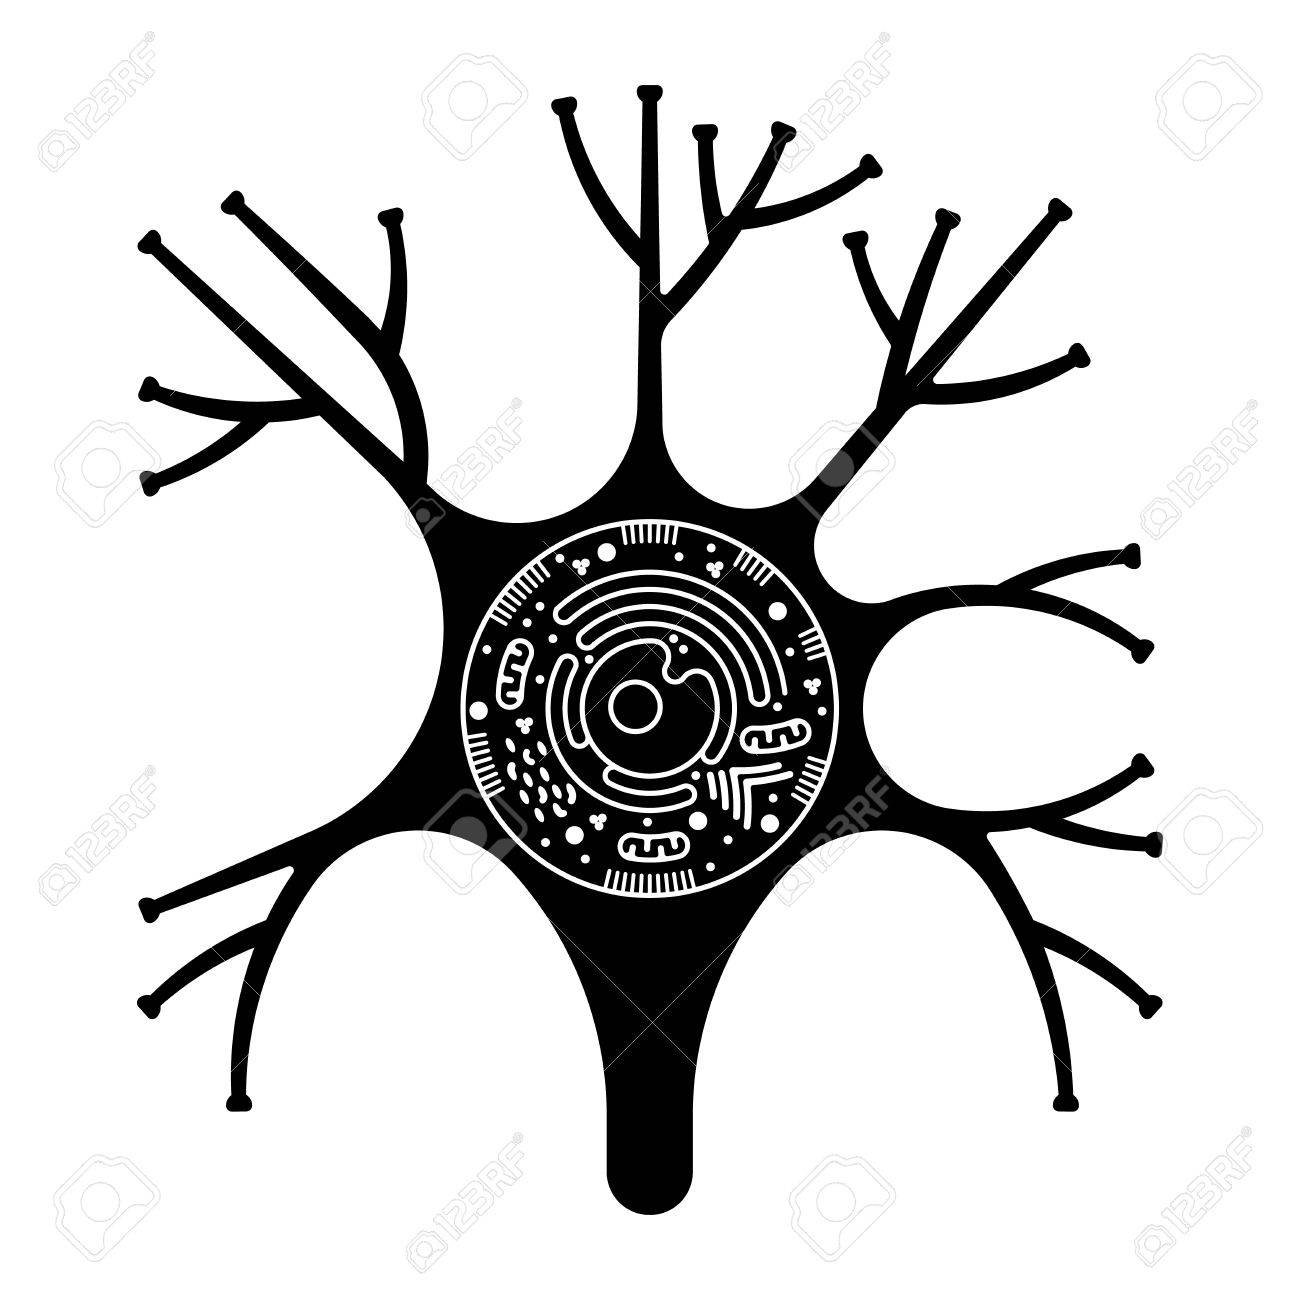 Pictograma Aislado Biología Celular. Anatomía Celular Ilustración De ...